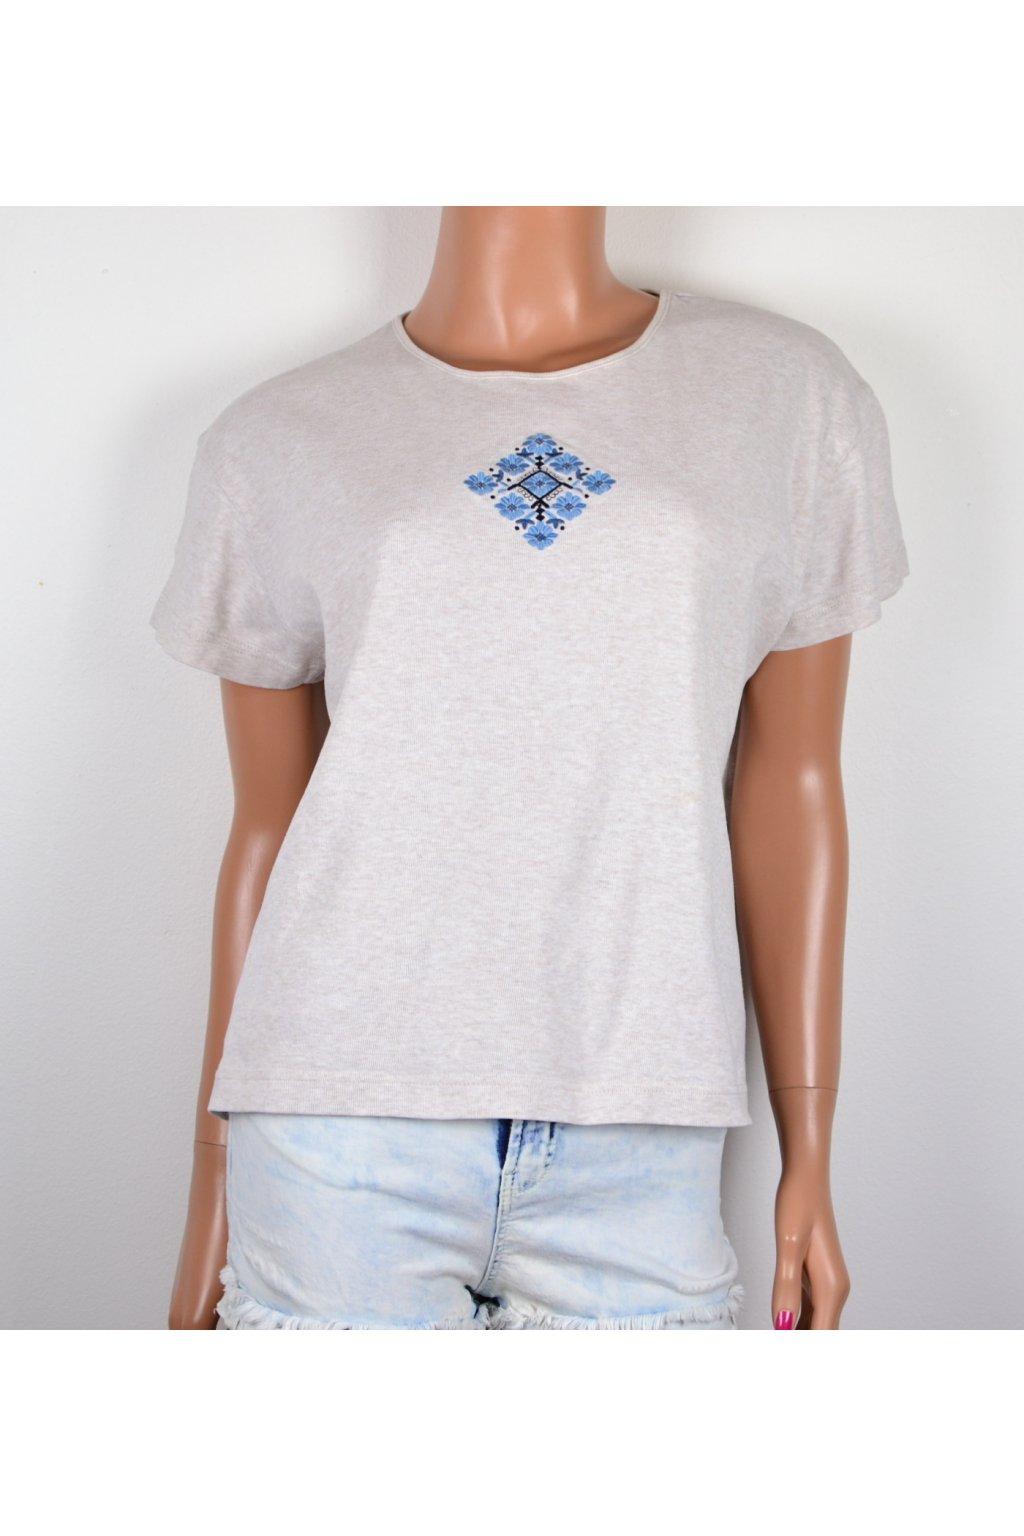 Tričko béžové Eastex XL